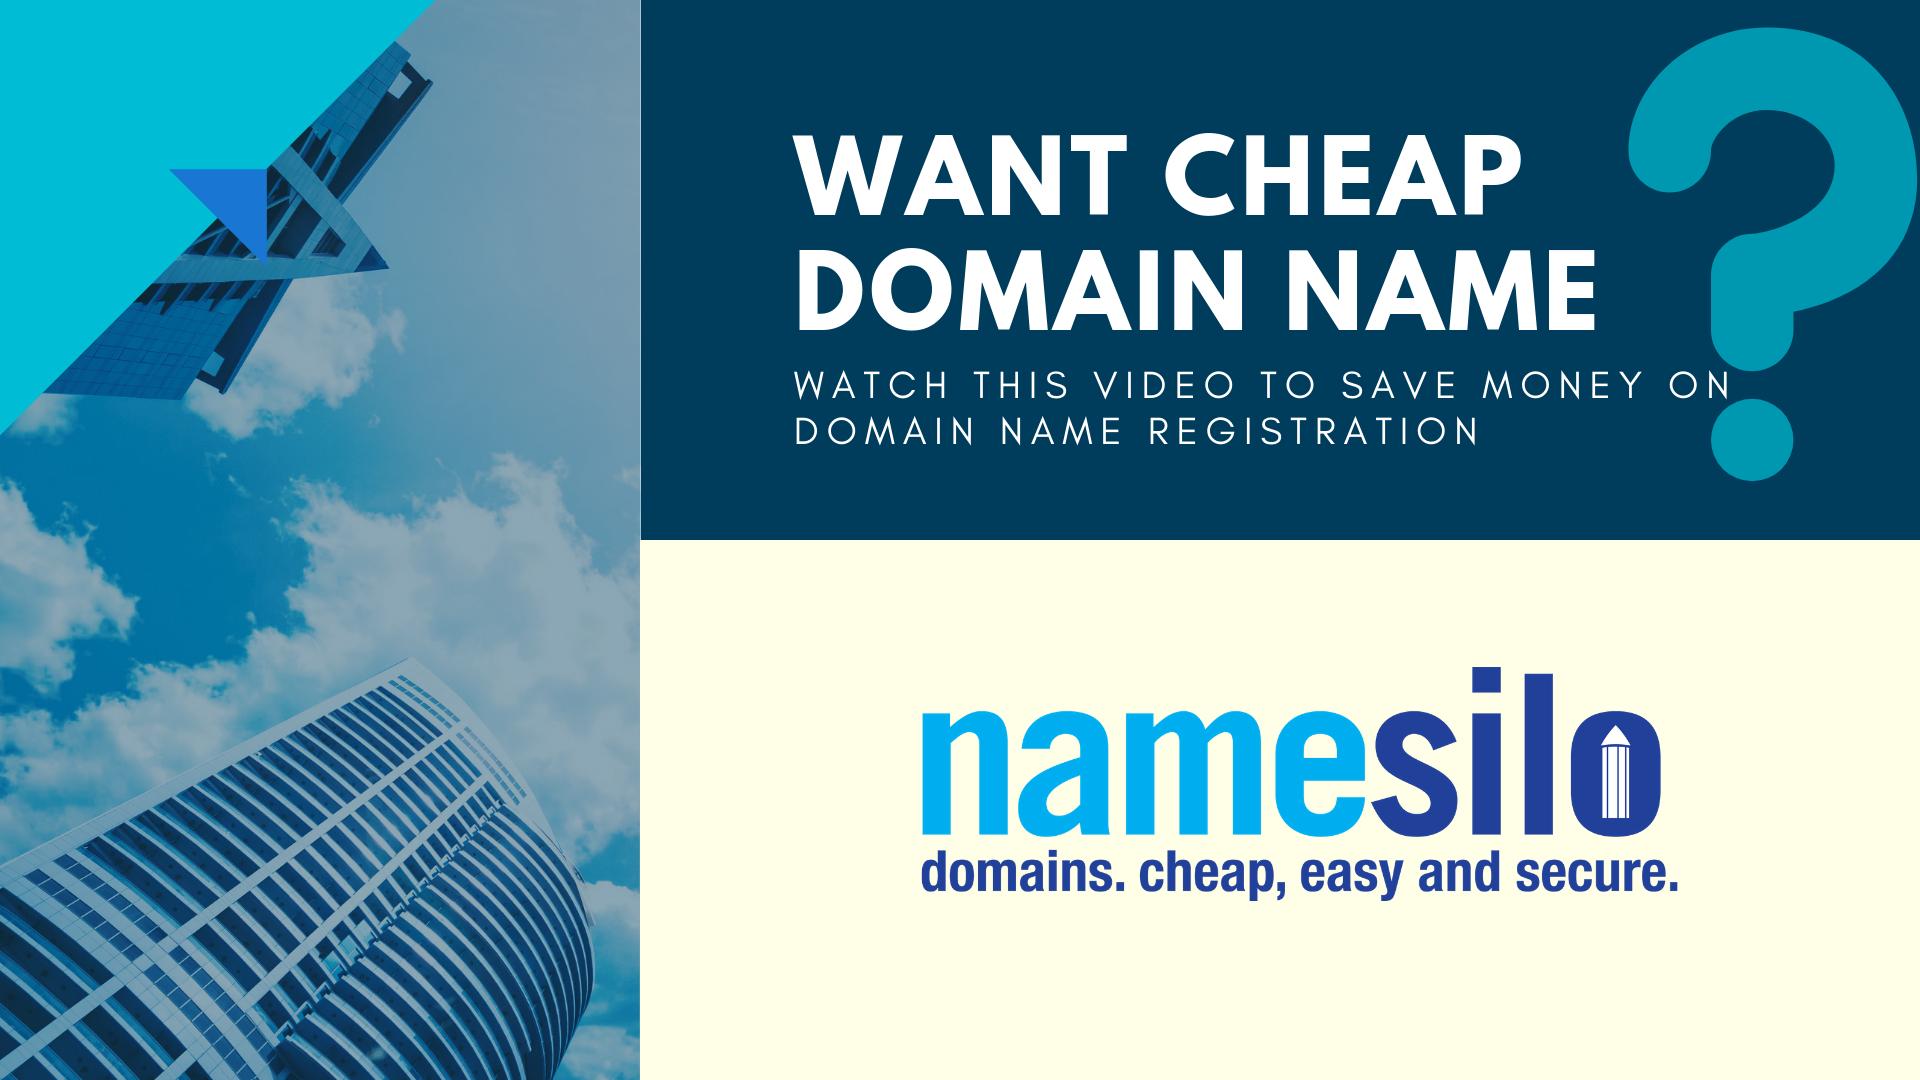 How to Register Cheapdomainname domain website